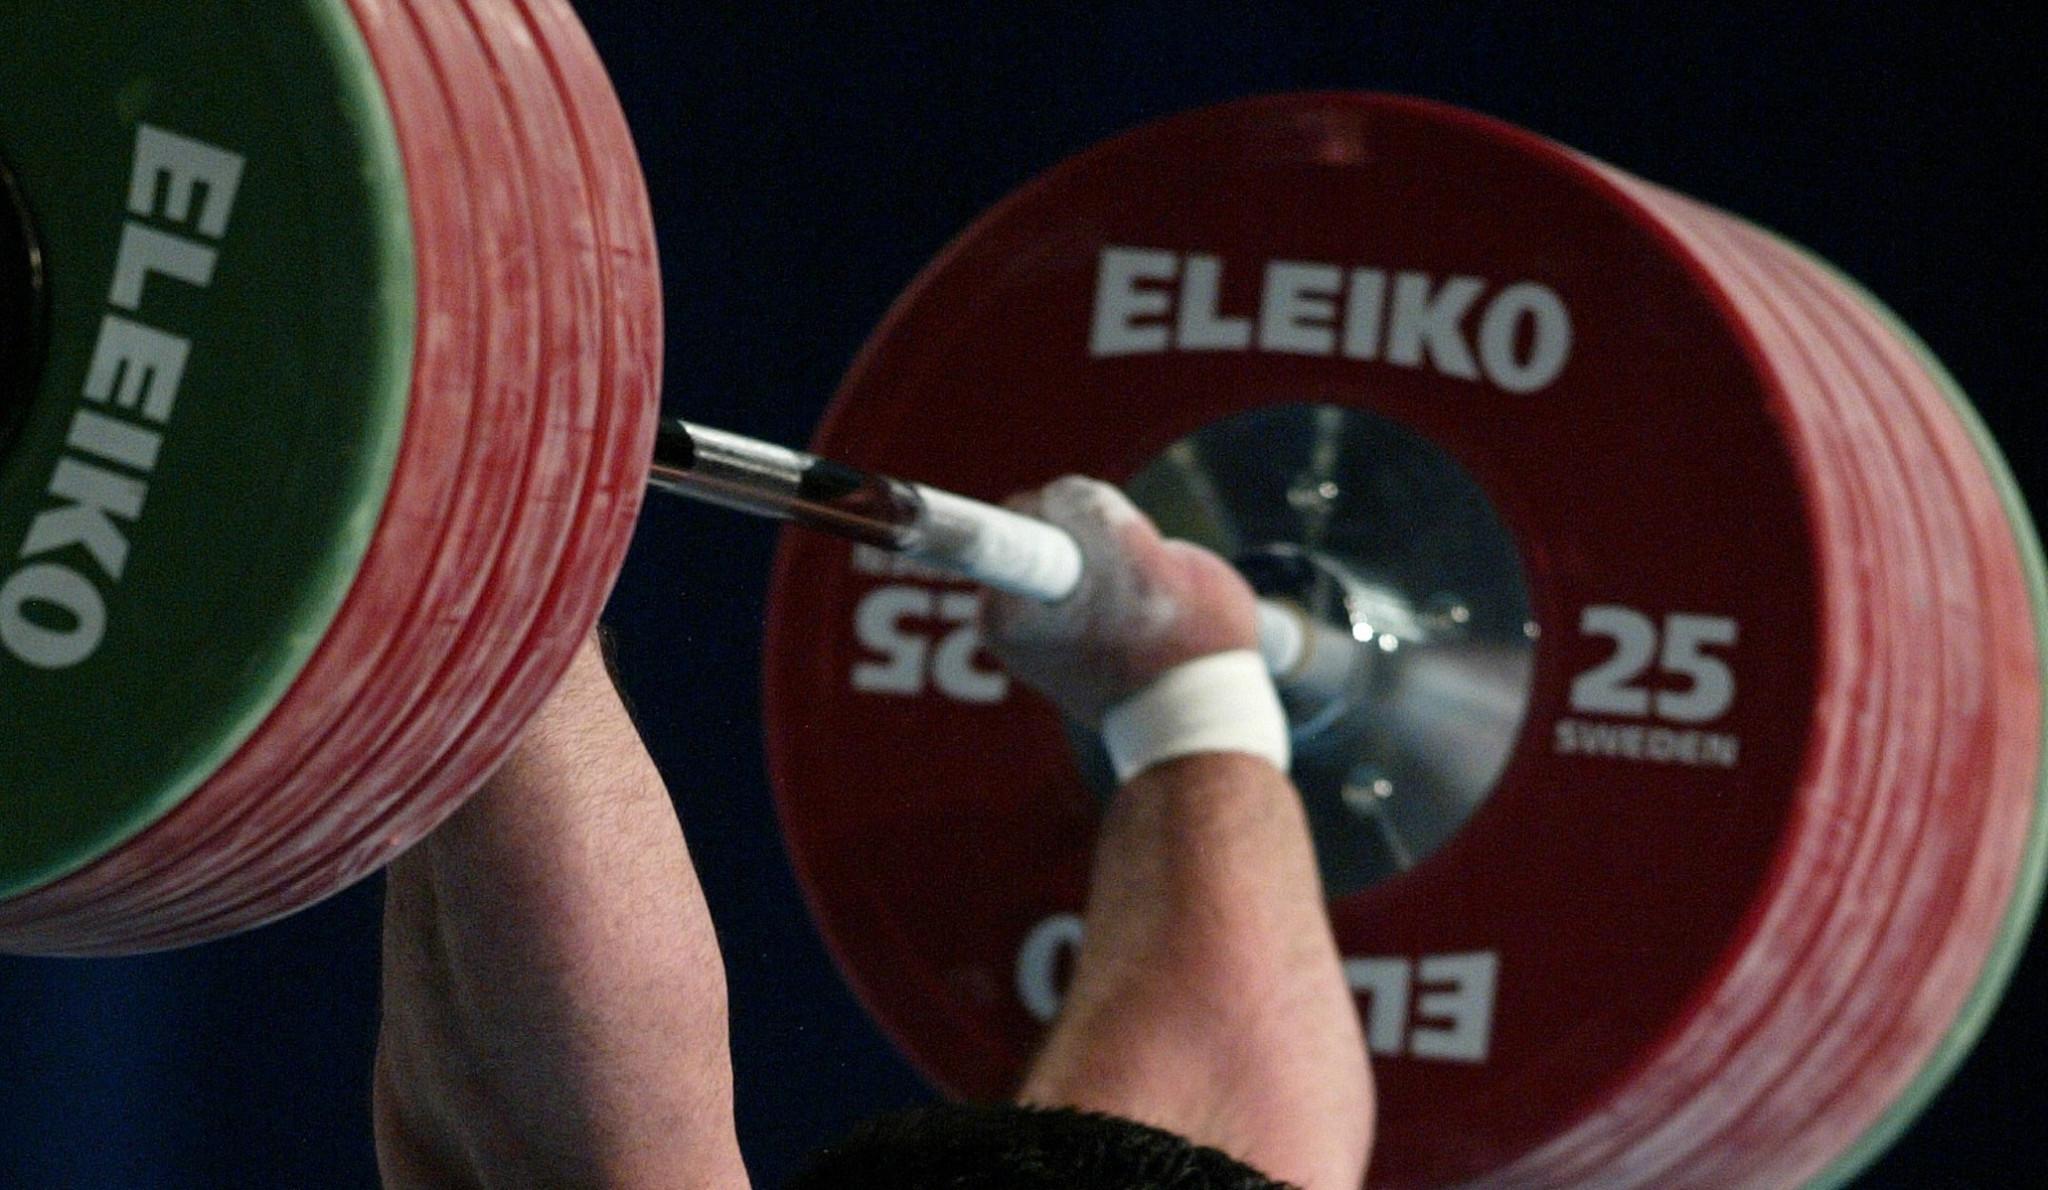 Asian Games weightlifting medallist Attar Ashrafi dies aged 72